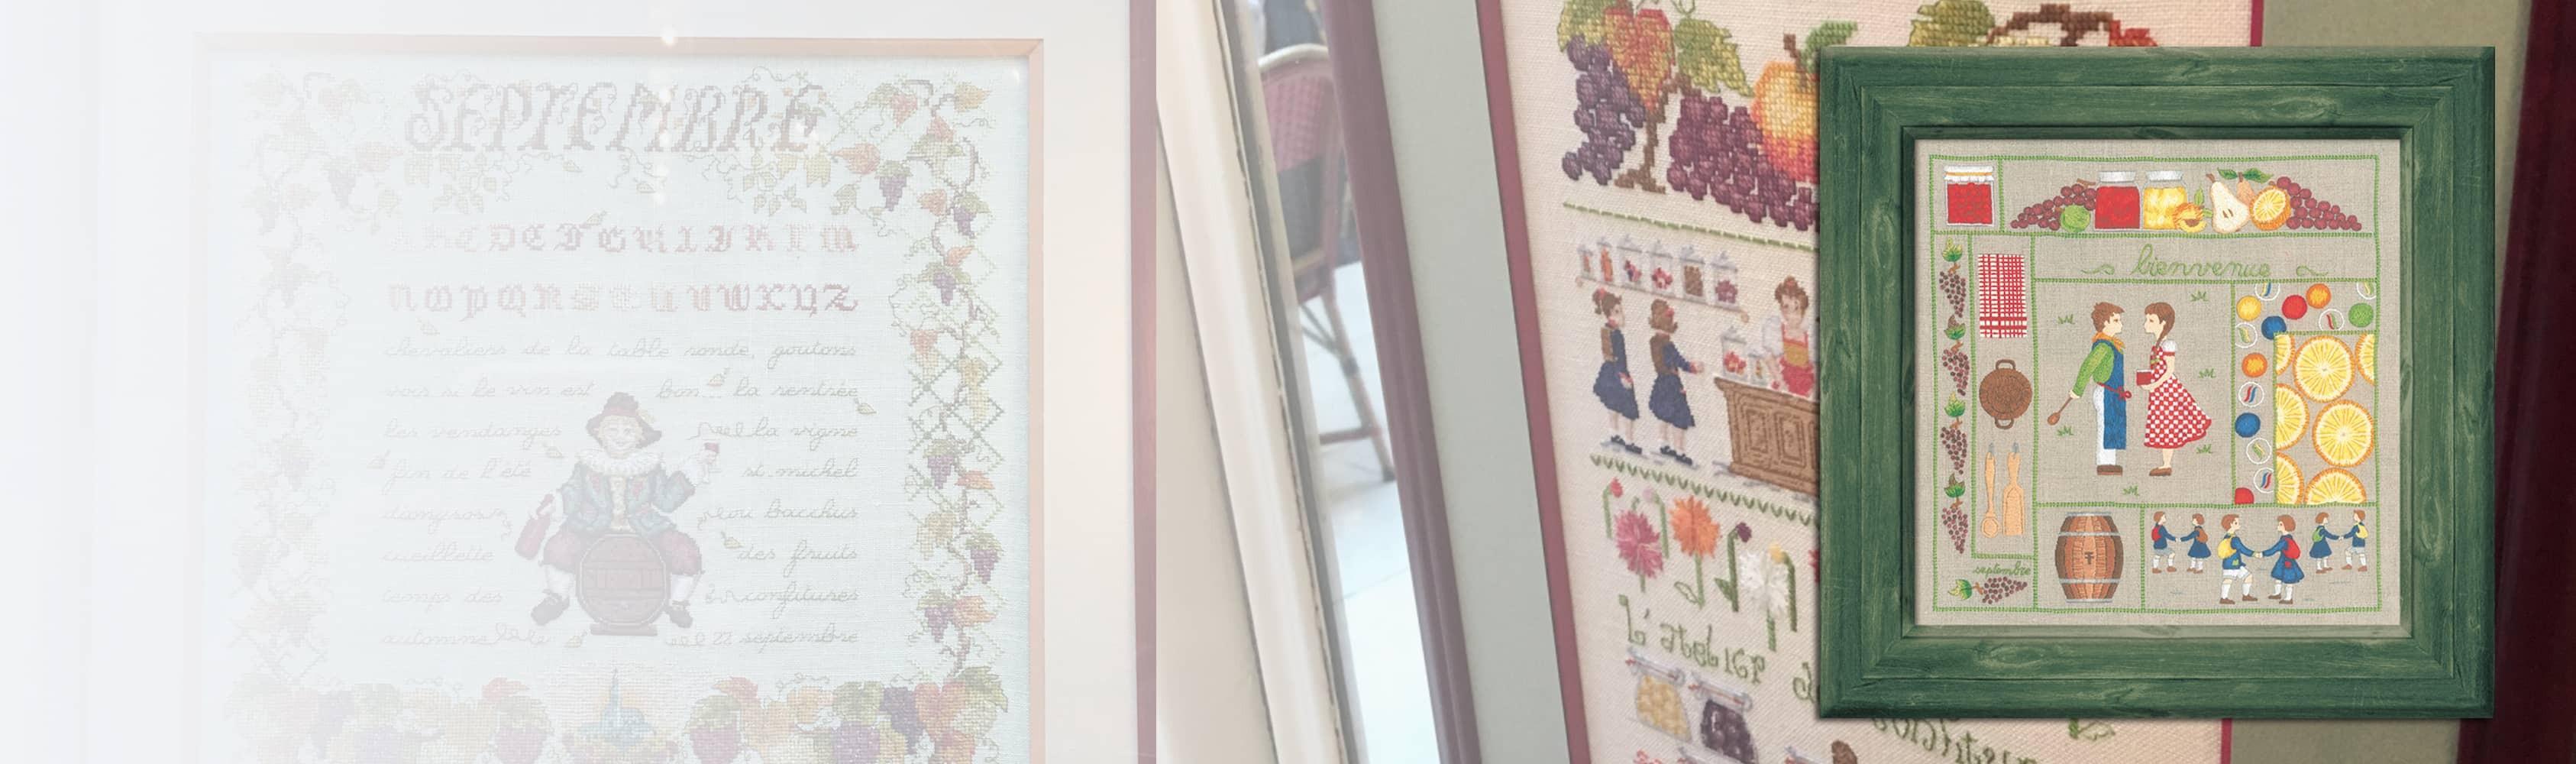 Welcome September -  traditional embroidery, printed kit. Le Bonheur des Dames 7709 Design by Cécile Vessière